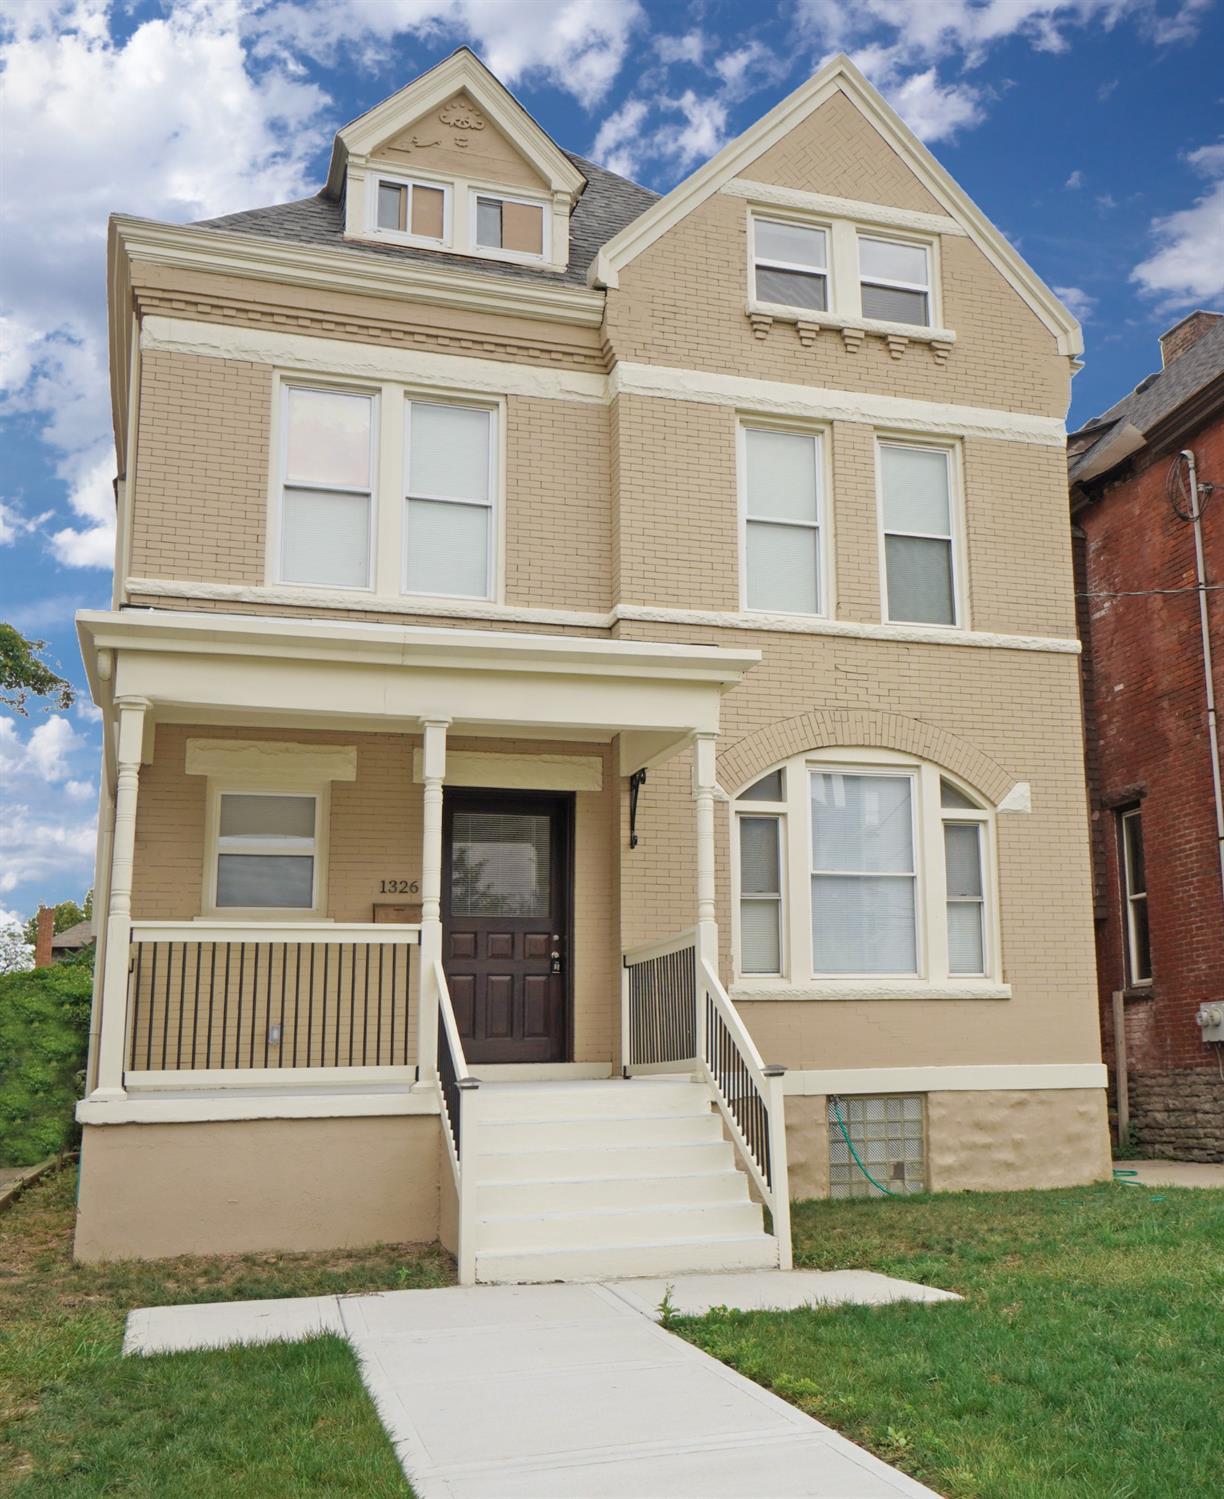 1326 Wm H Taft Road, Cincinnati, Ohio 45206, 4 Bedrooms Bedrooms, 14 Rooms Rooms,3 BathroomsBathrooms,Single Family Residence,For Sale,Wm H Taft,1716846